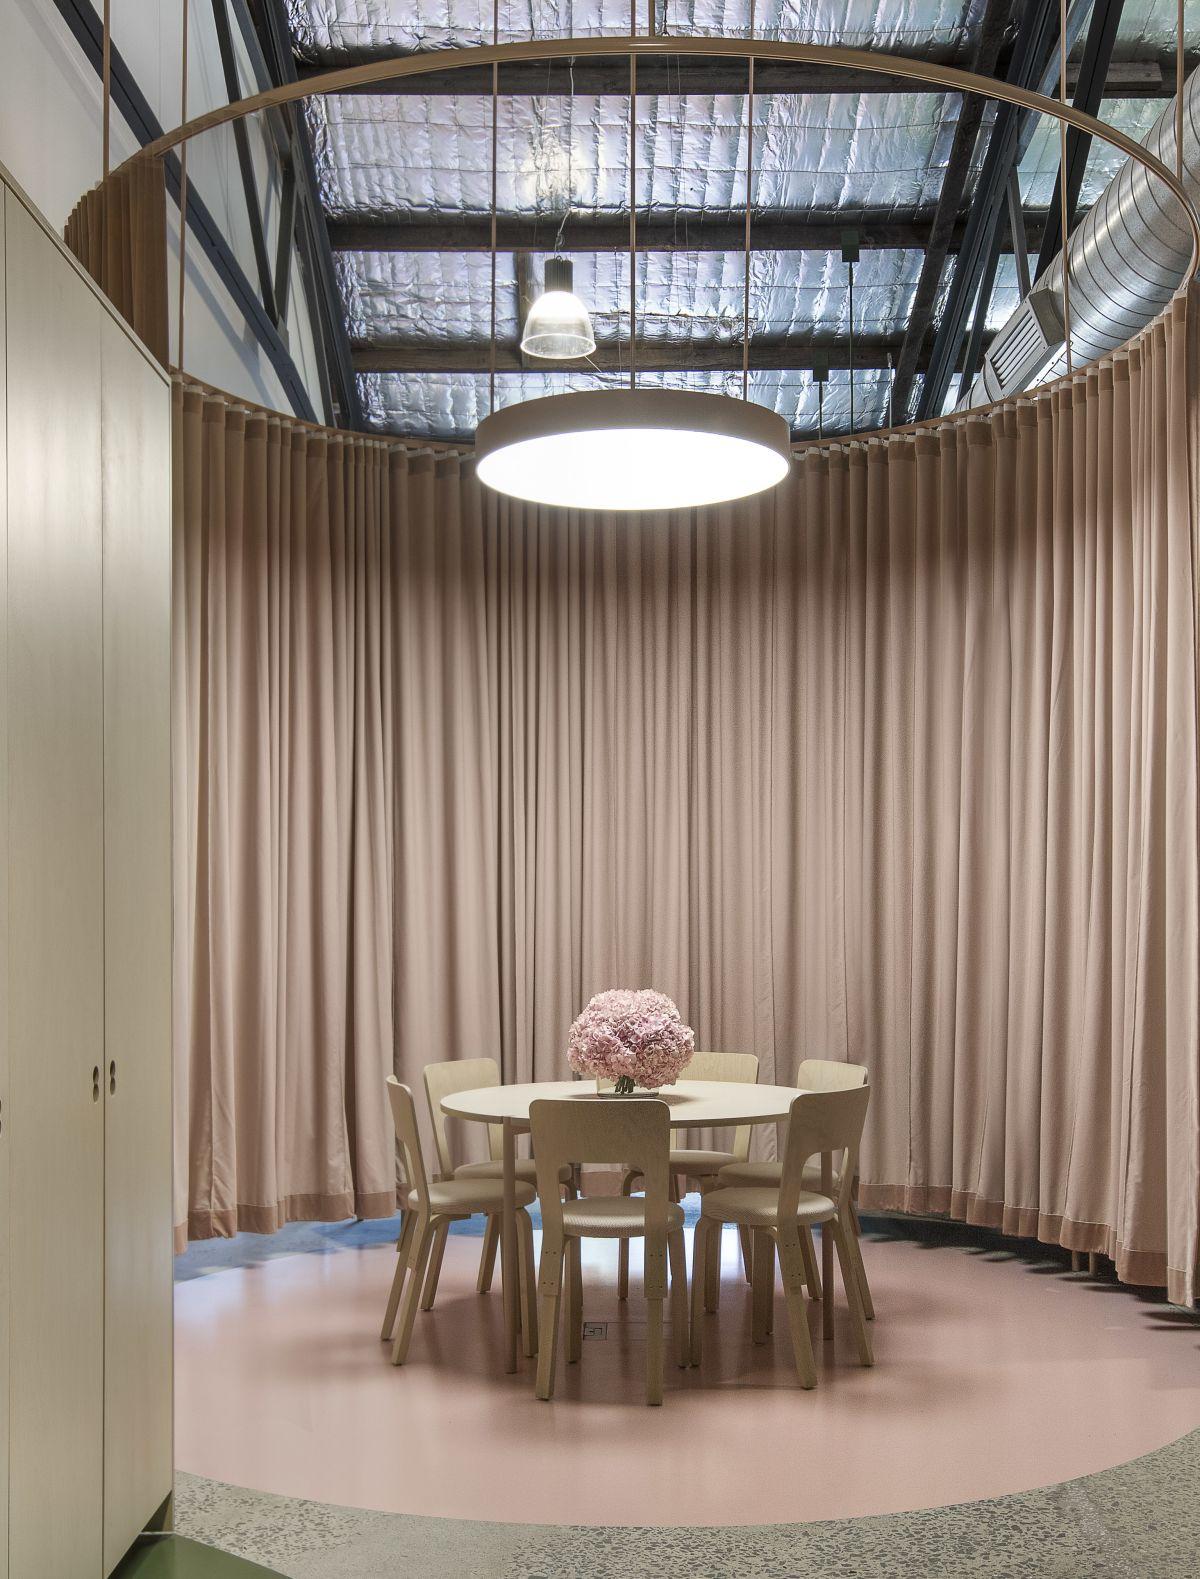 Bresnic Whitney Office, Rosbery, Australia